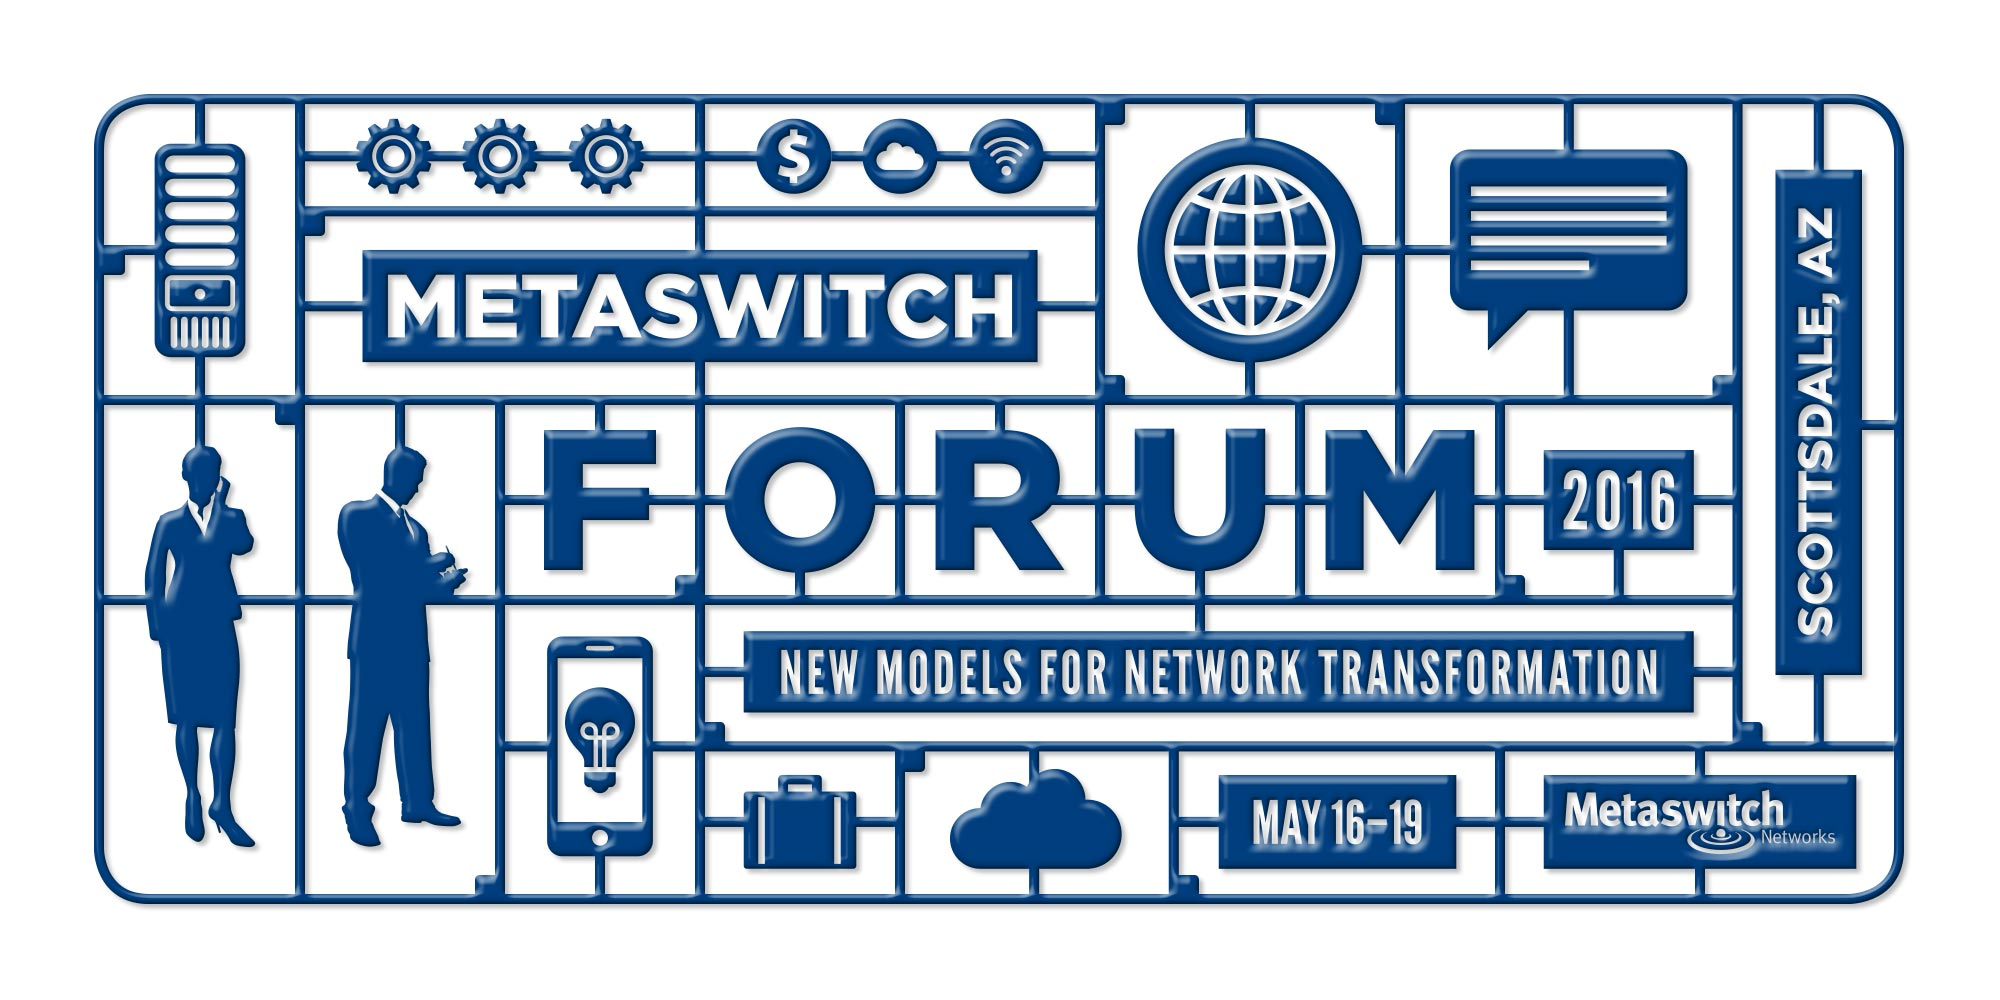 forum-2016-title-blue.jpg